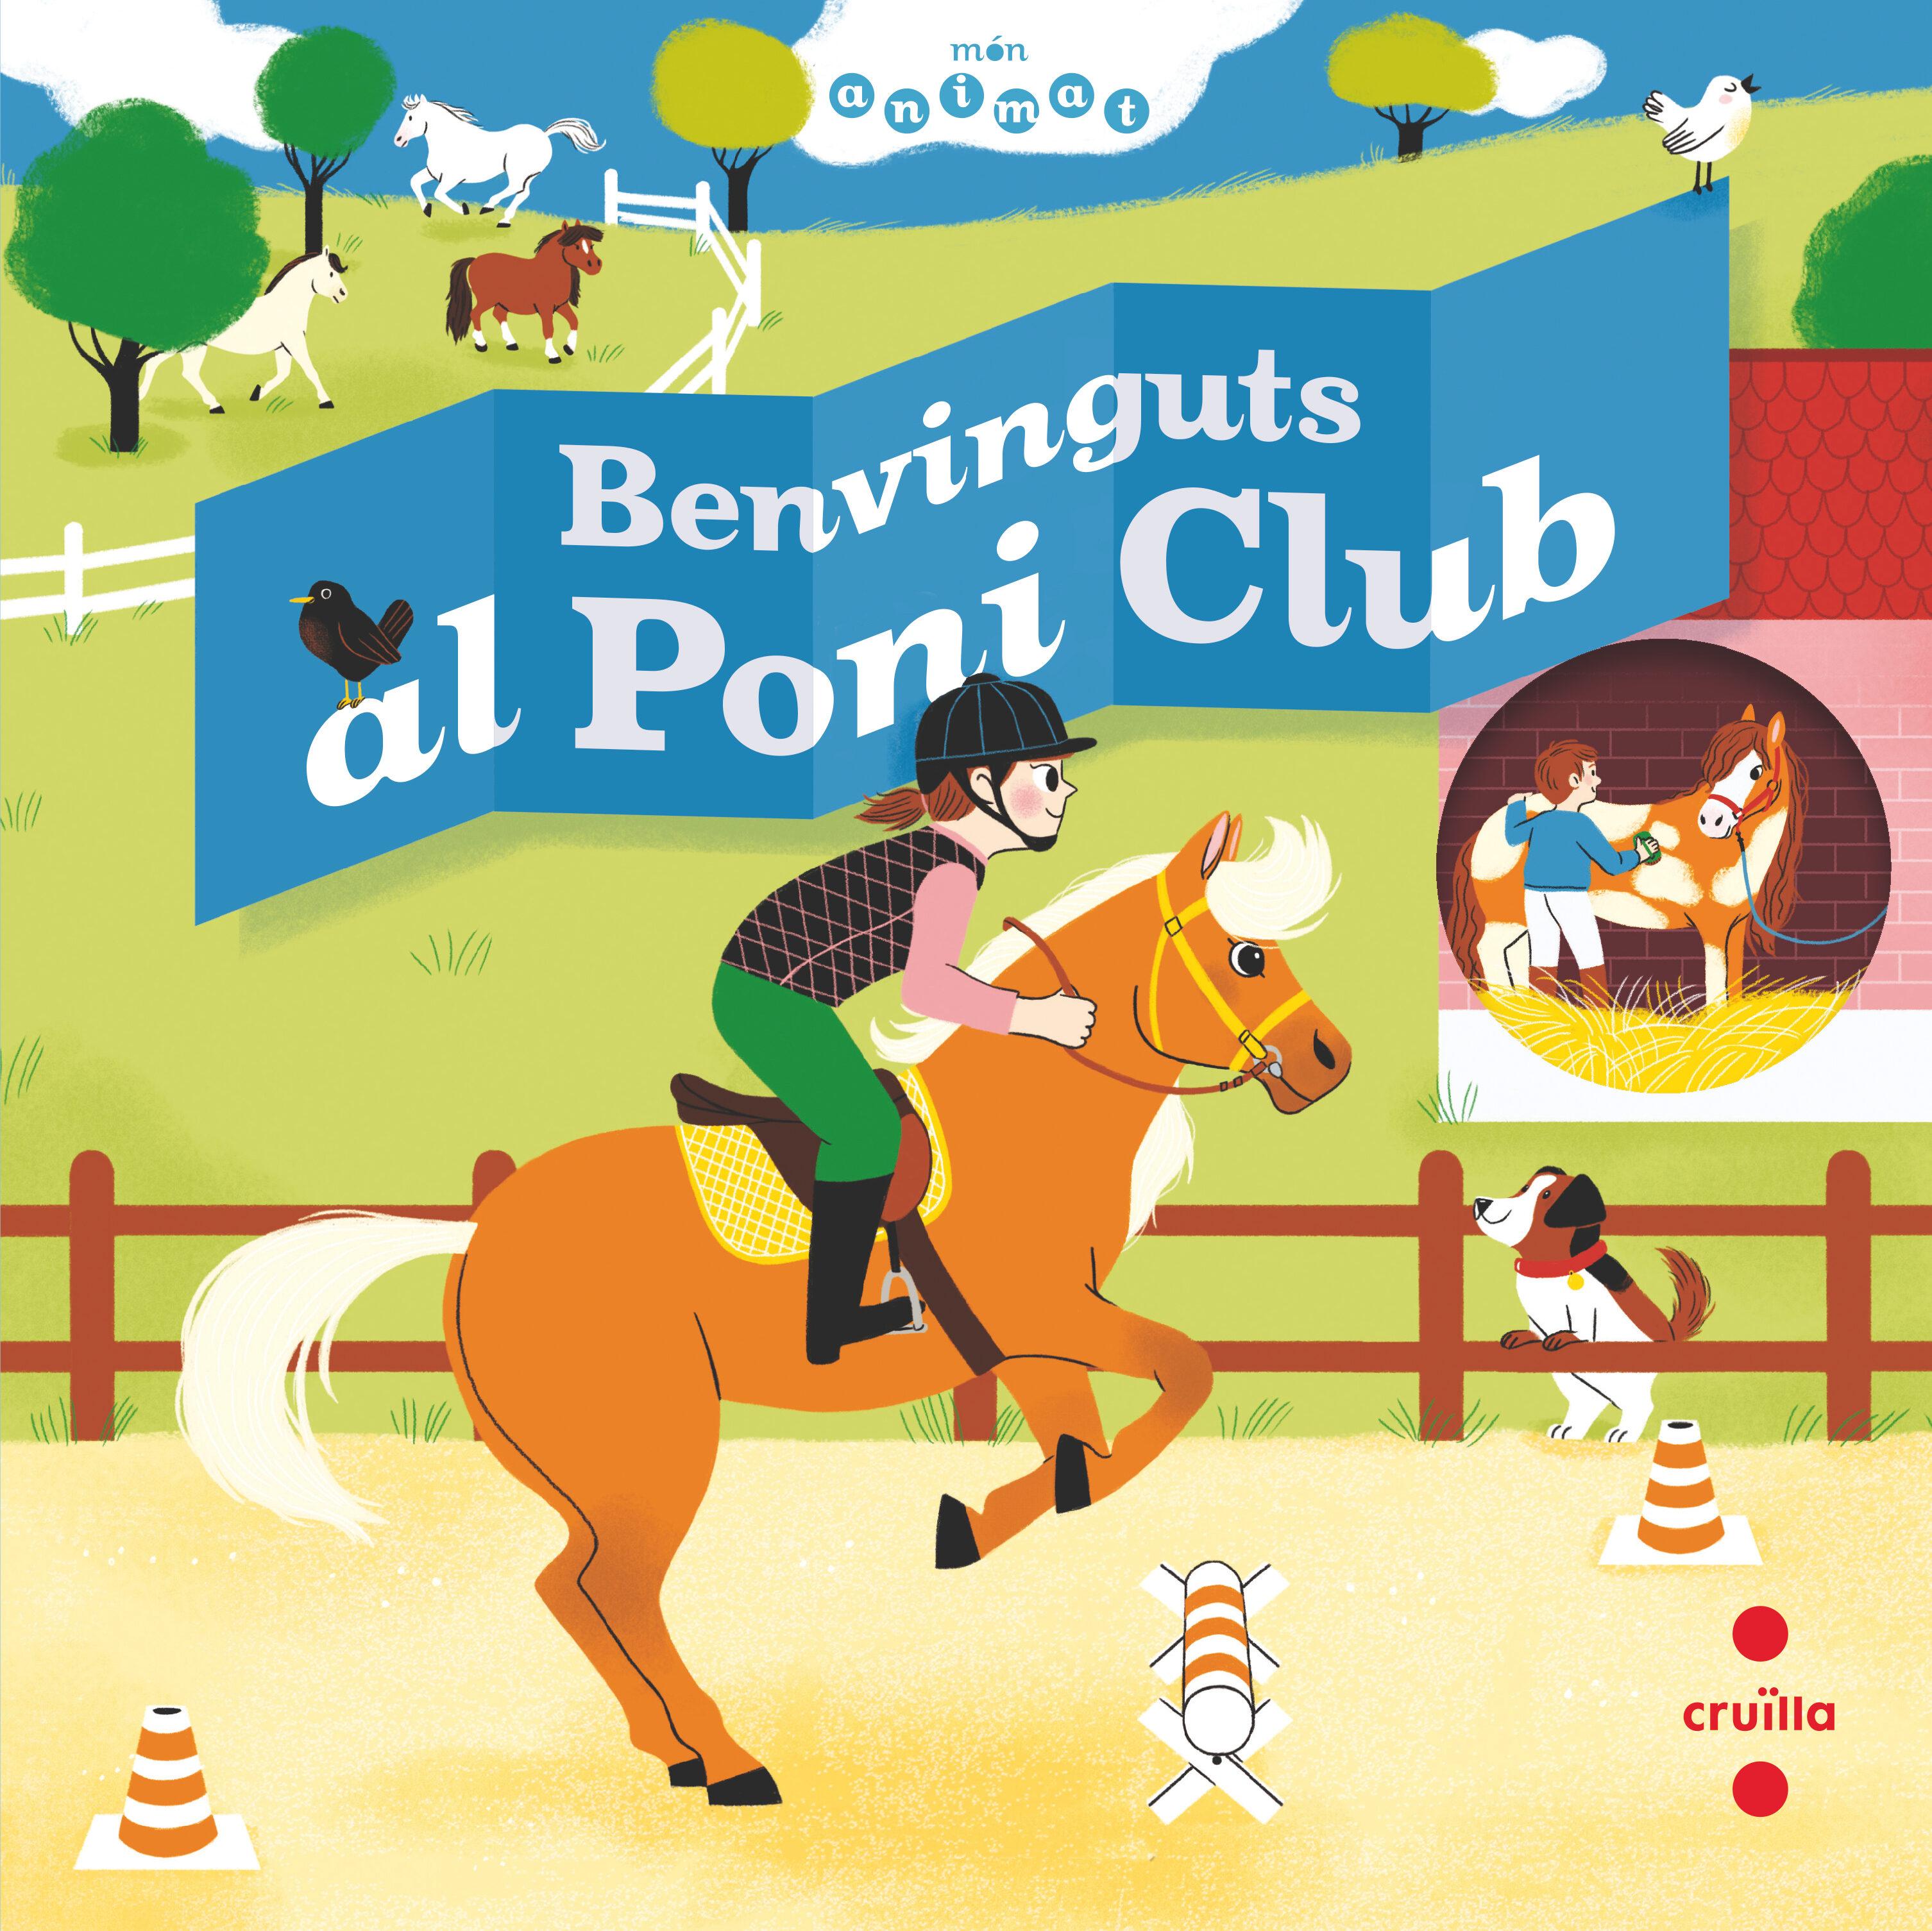 Benvinguts Al Poni Club - Baumann Anne-sophie